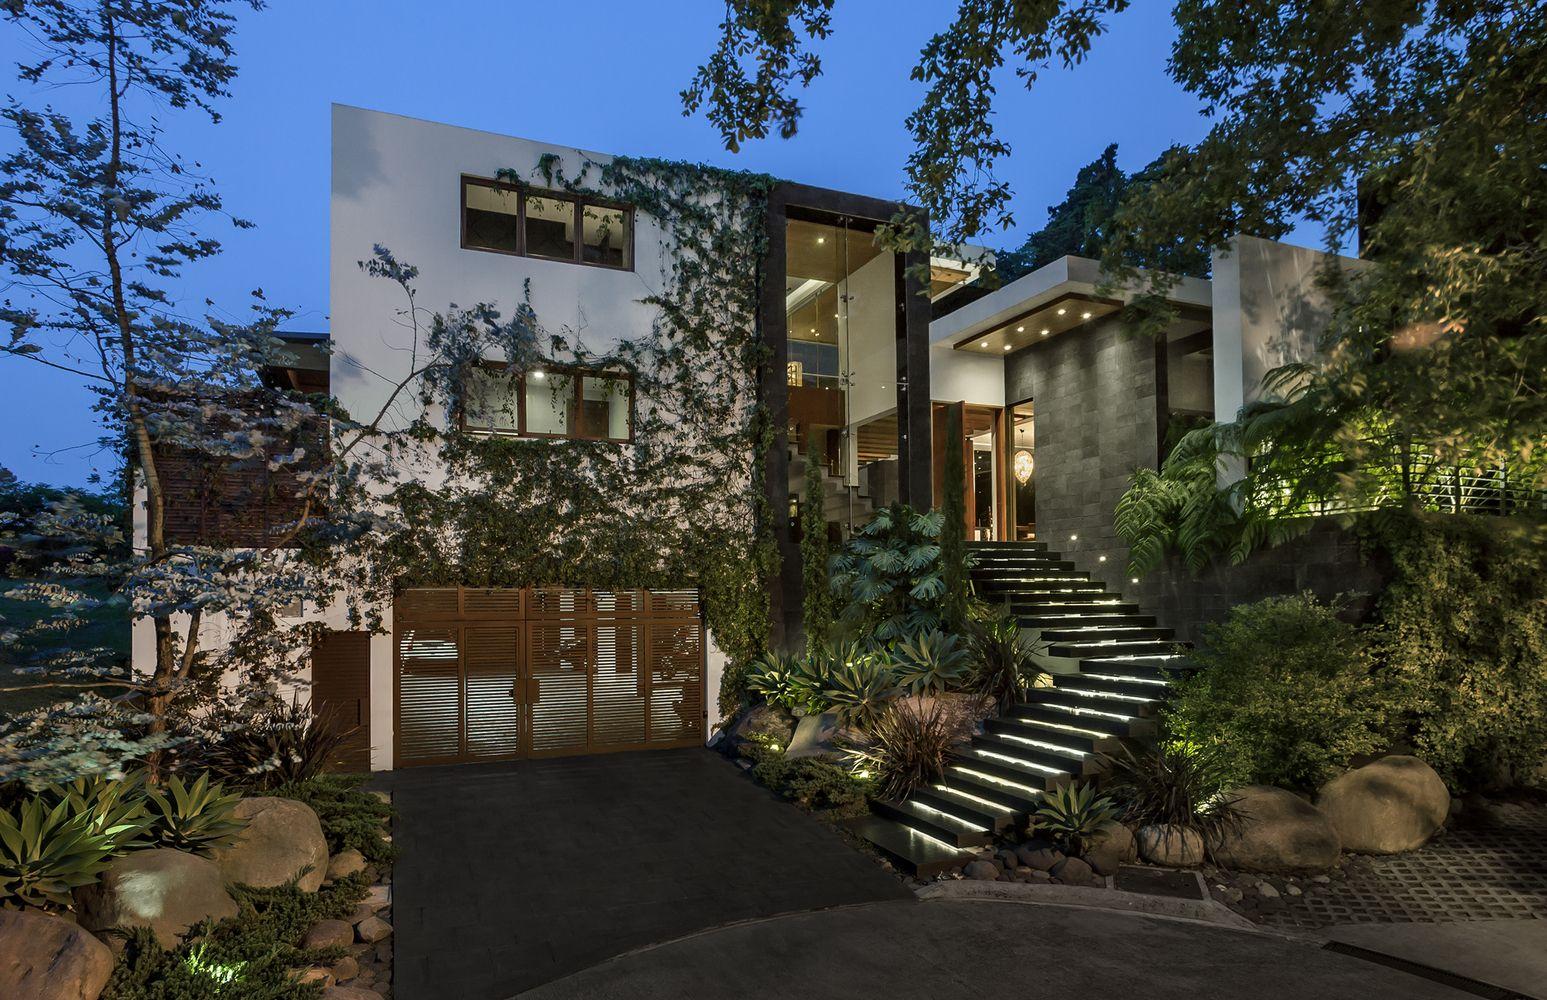 Home design bilder eine etage gallery of san isidro residence  valls arquitectos    建築ed